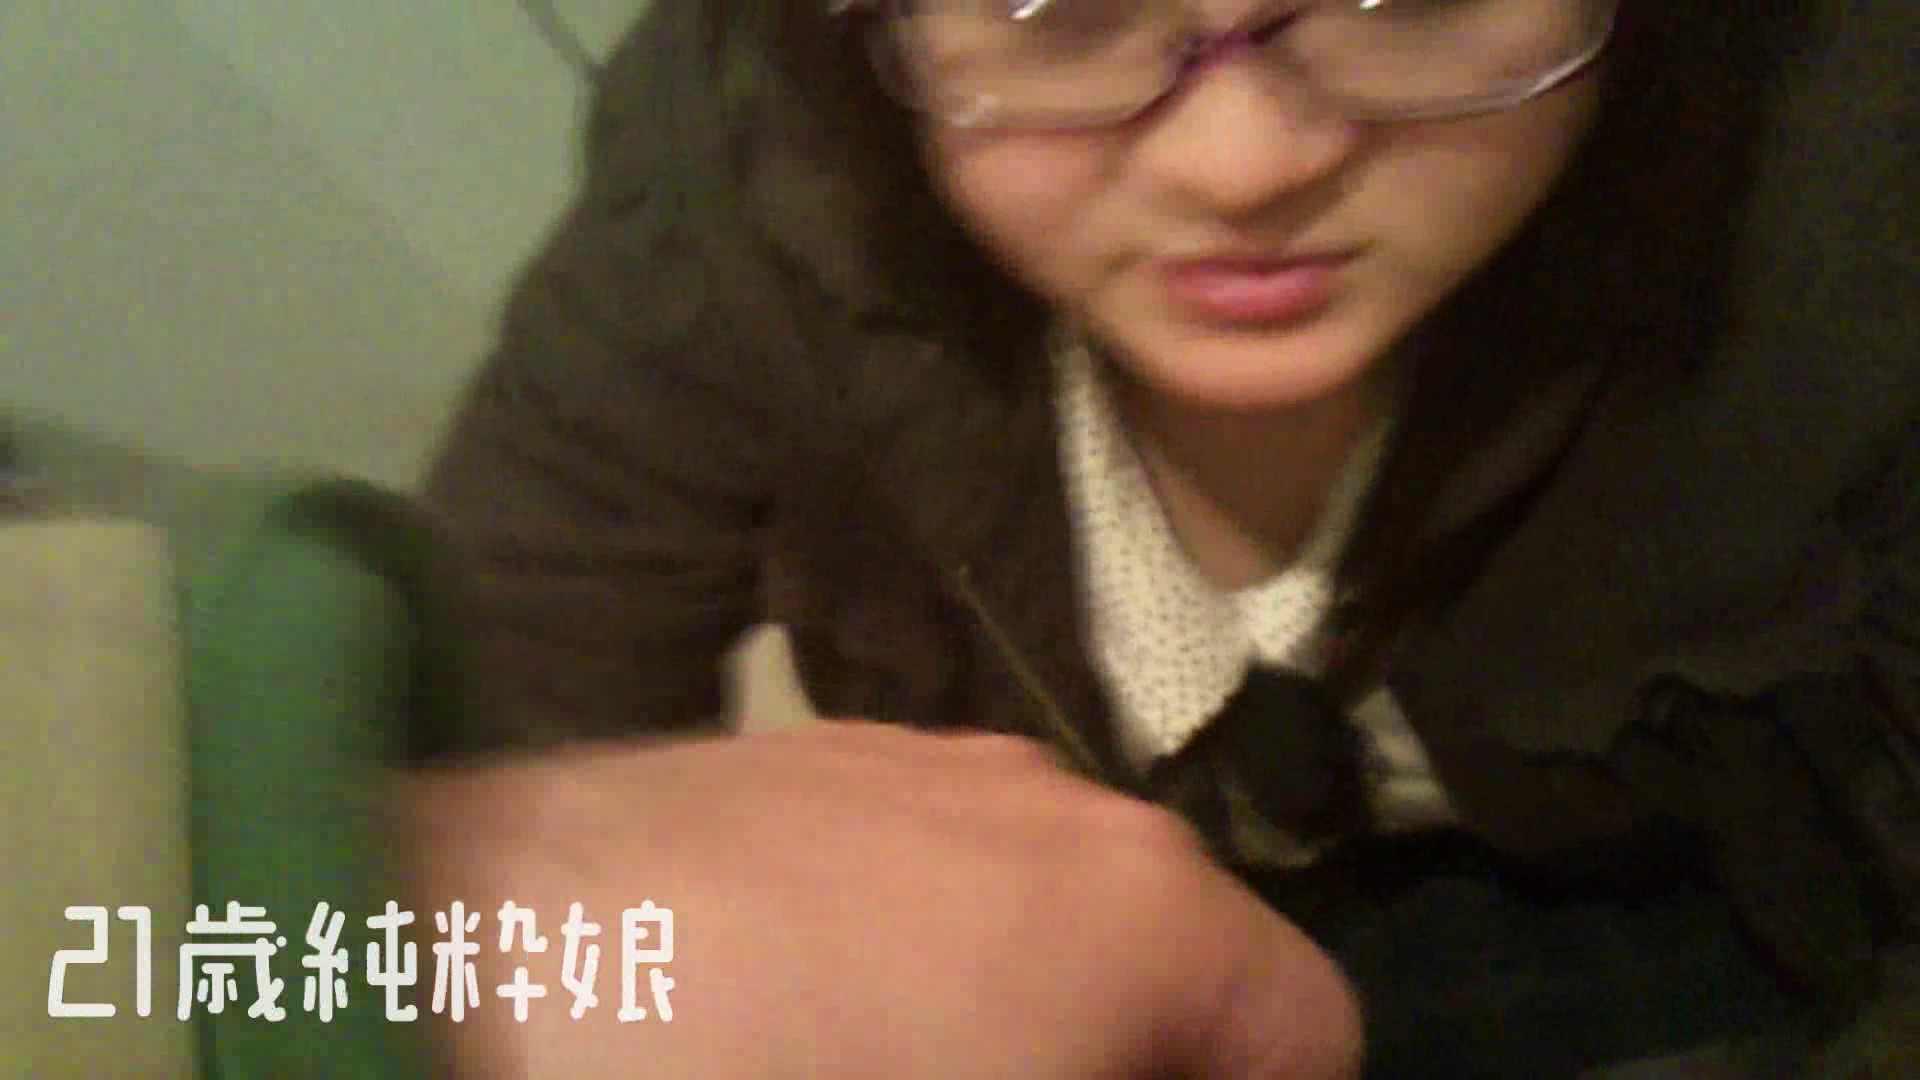 Gカップ21歳純粋嬢第2弾Vol.5 性欲丸出し | 学校  101pic 28